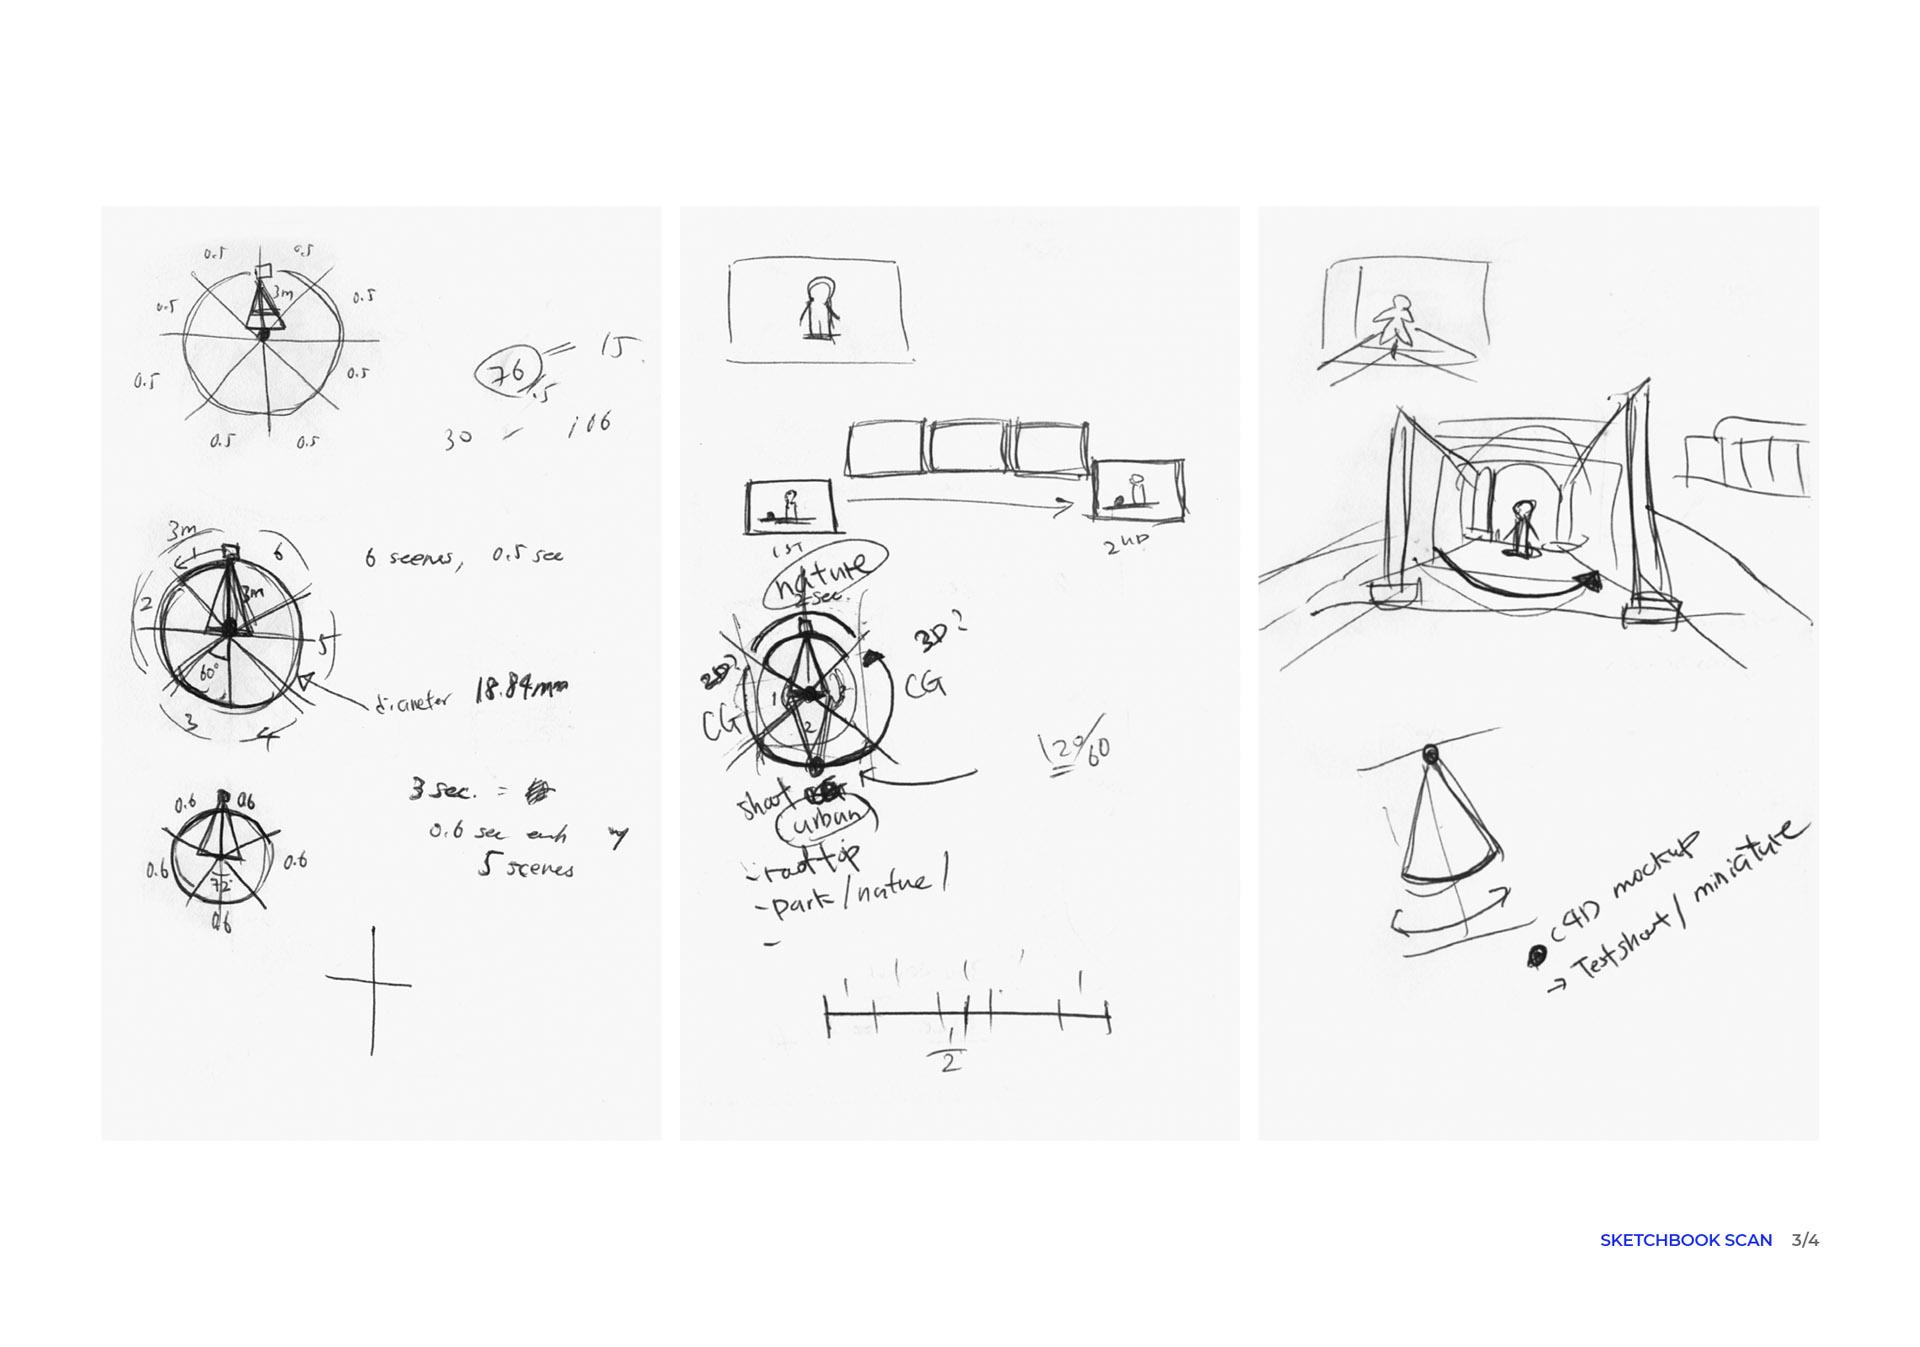 Kazuyukiishii-ecp2-sketchbook_p3-1920w